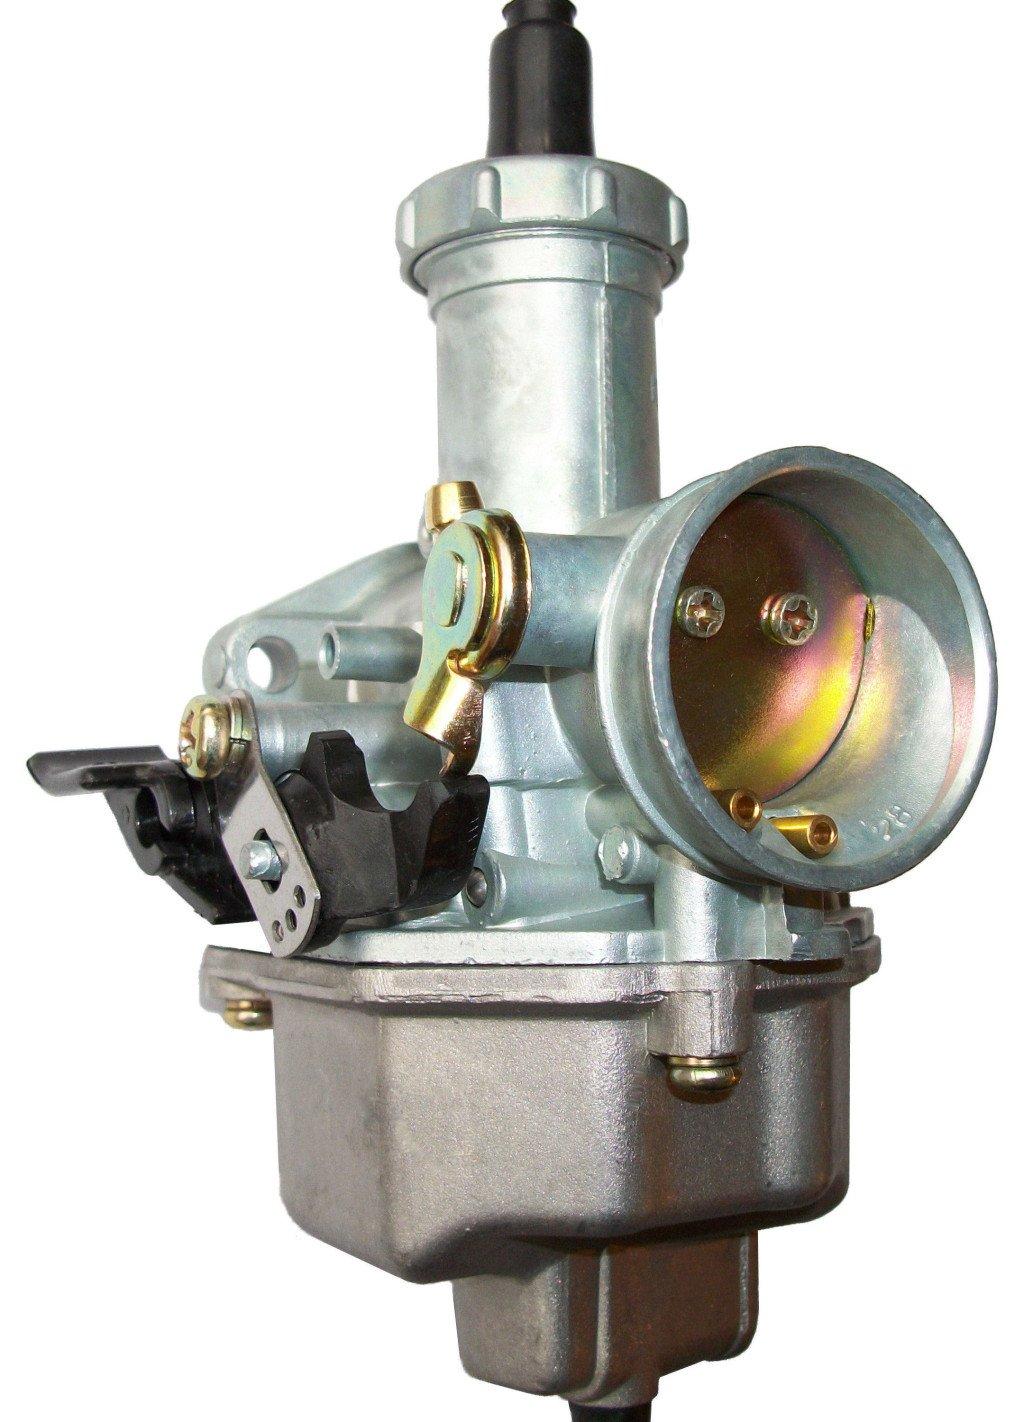 Amazon.com: 1981 1982 1983 Honda ATC 185S ATC185S Carburetor Choke Lever  Style 3 Wheel Carb: Automotive